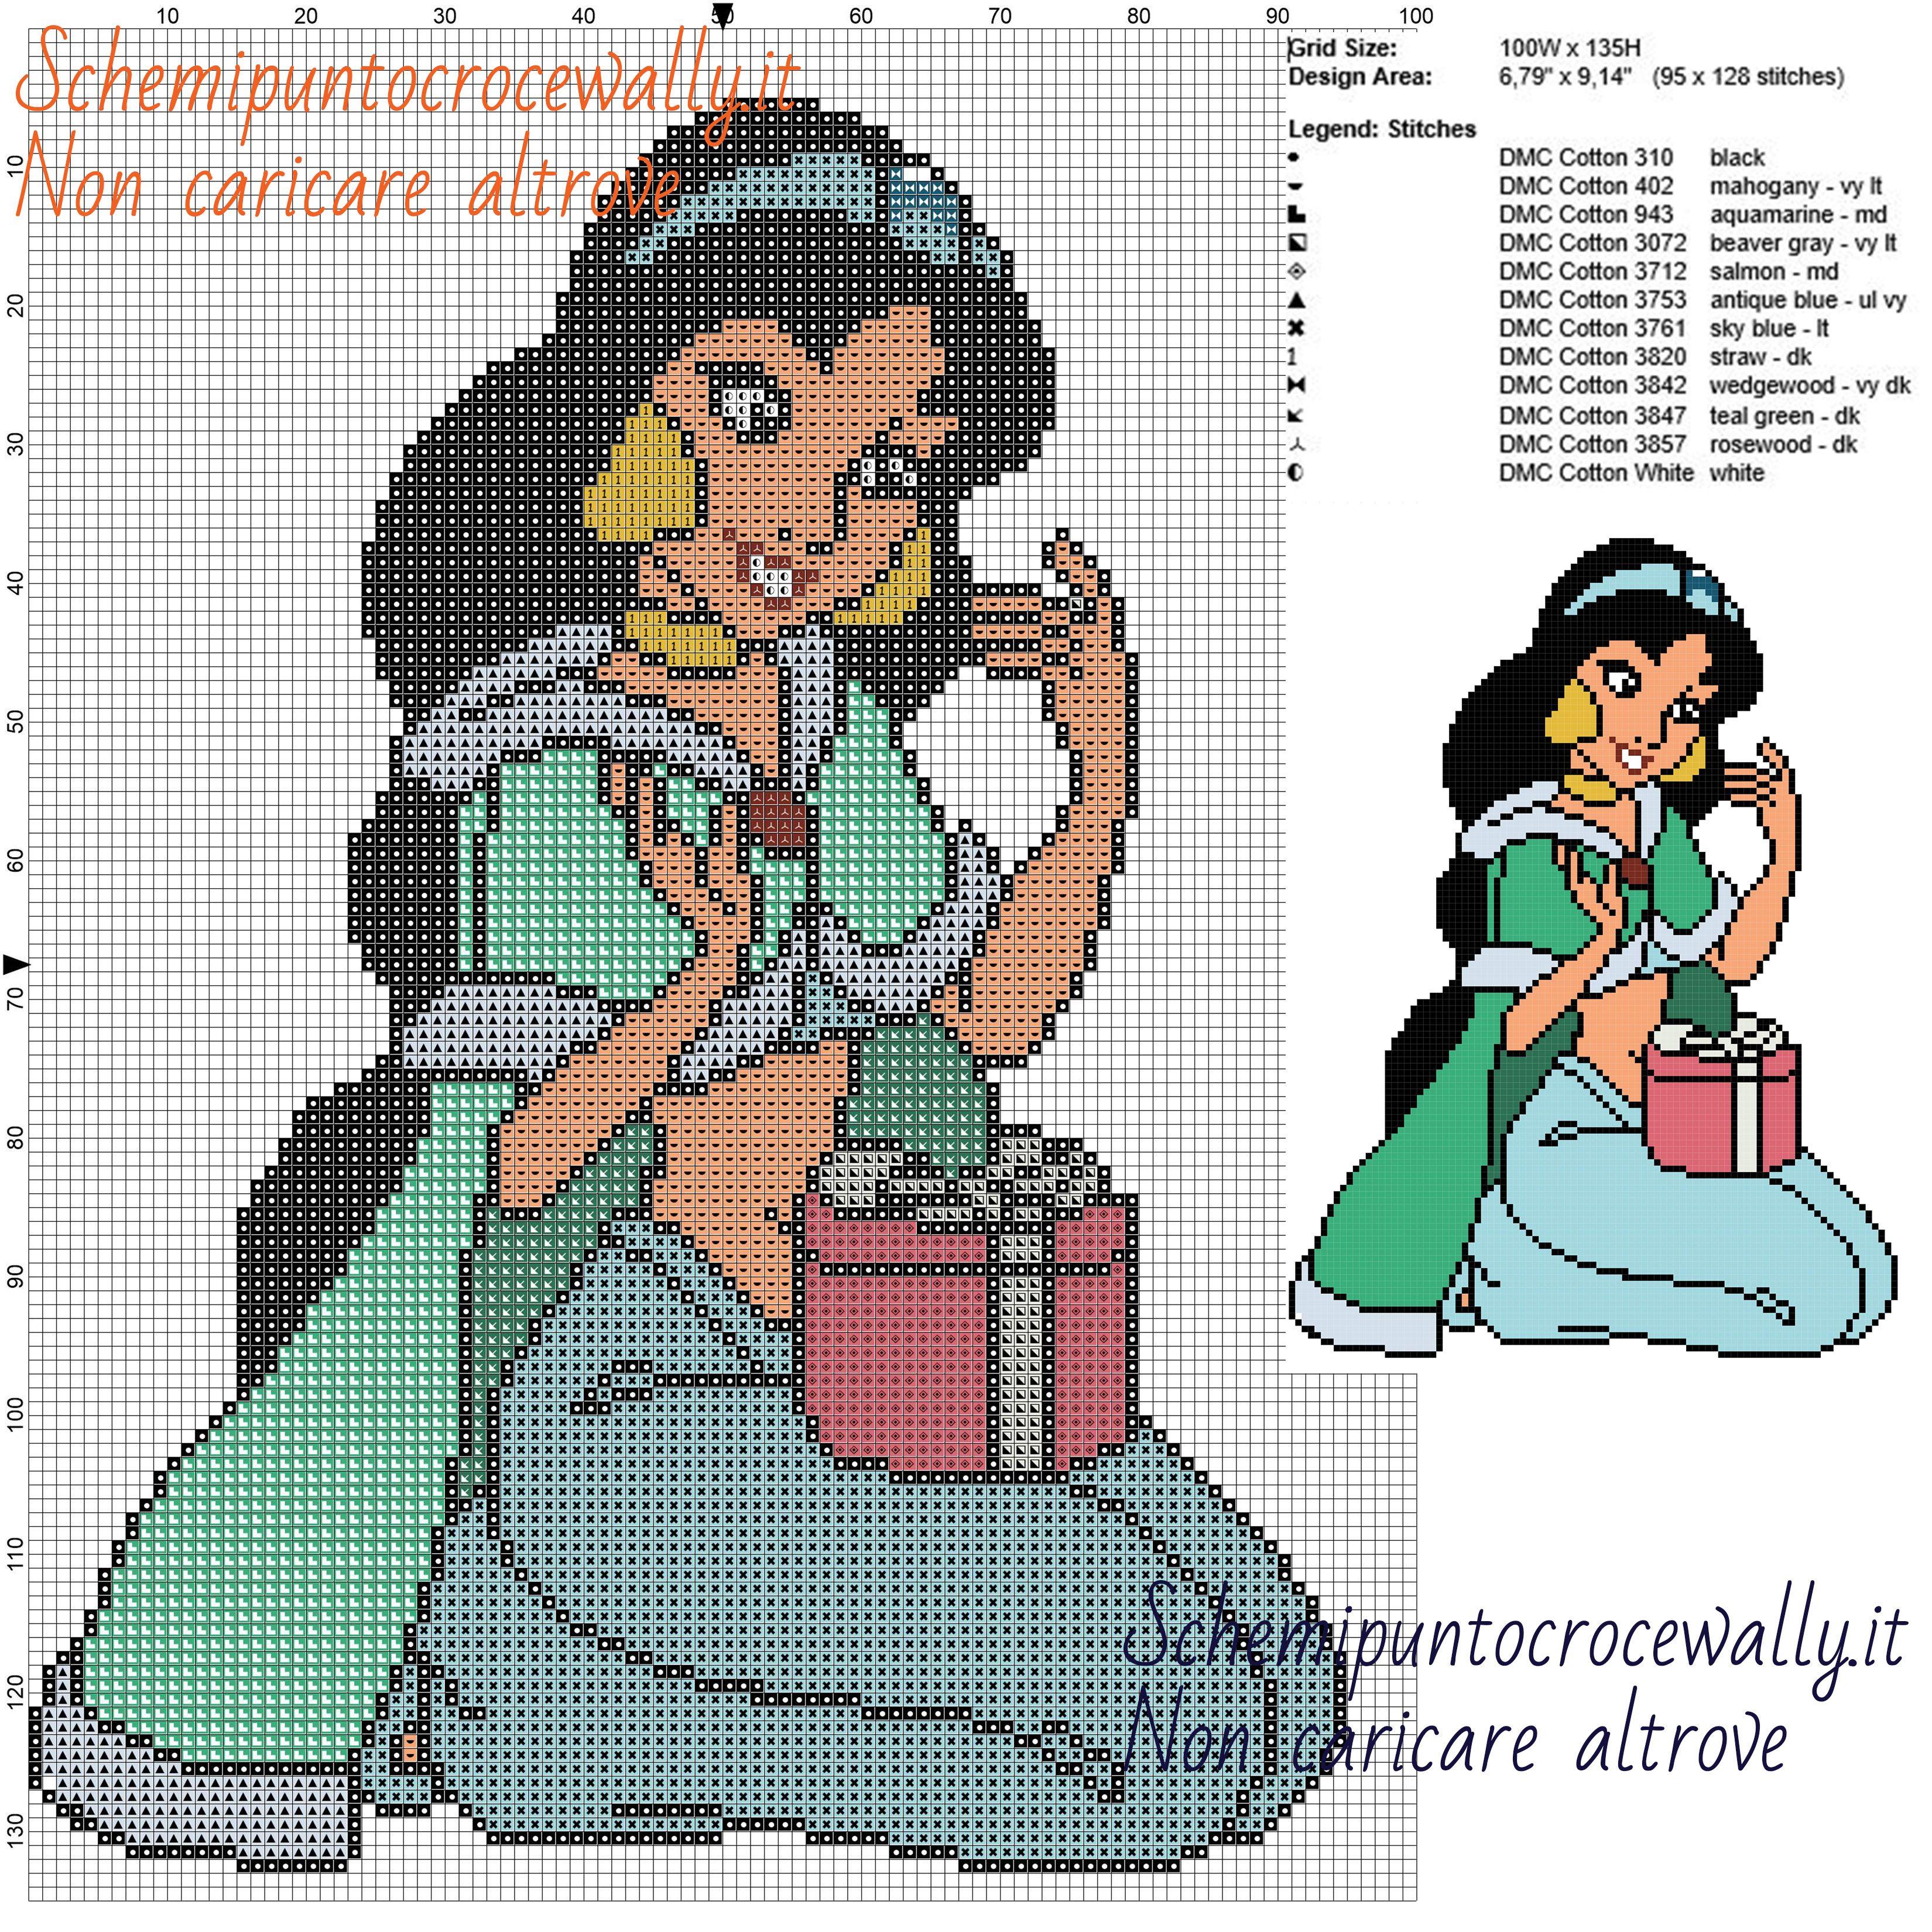 Jasmine nalizia schema disney gratis a punto croce 100x135 for Schemi gratis punto croce disney